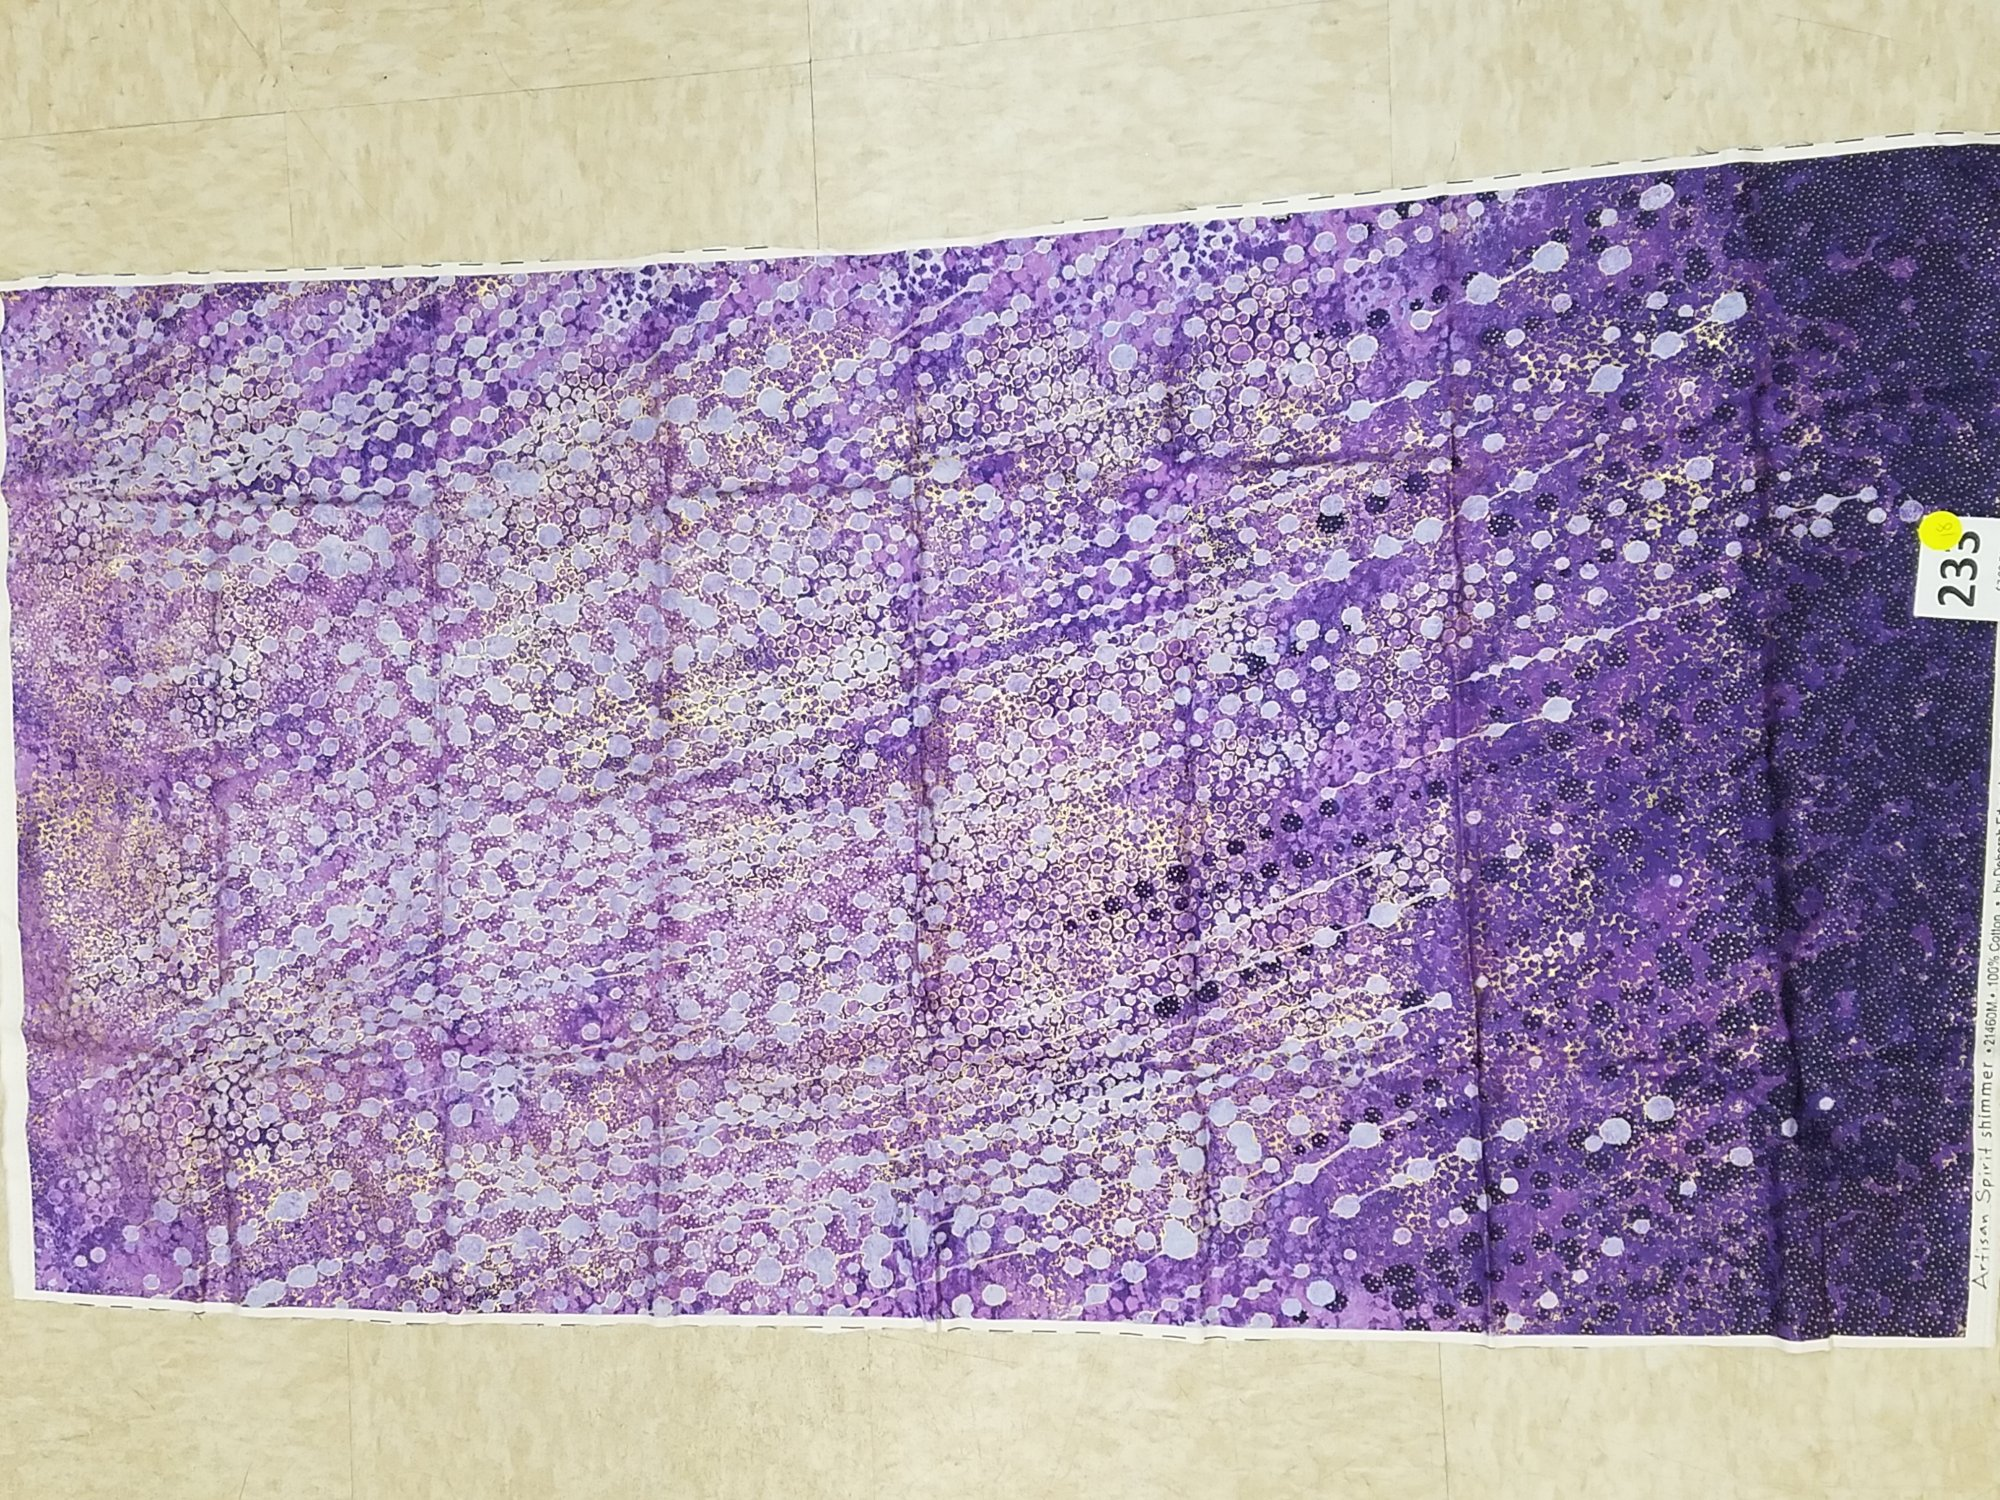 Panel 233 shimmer echos purple